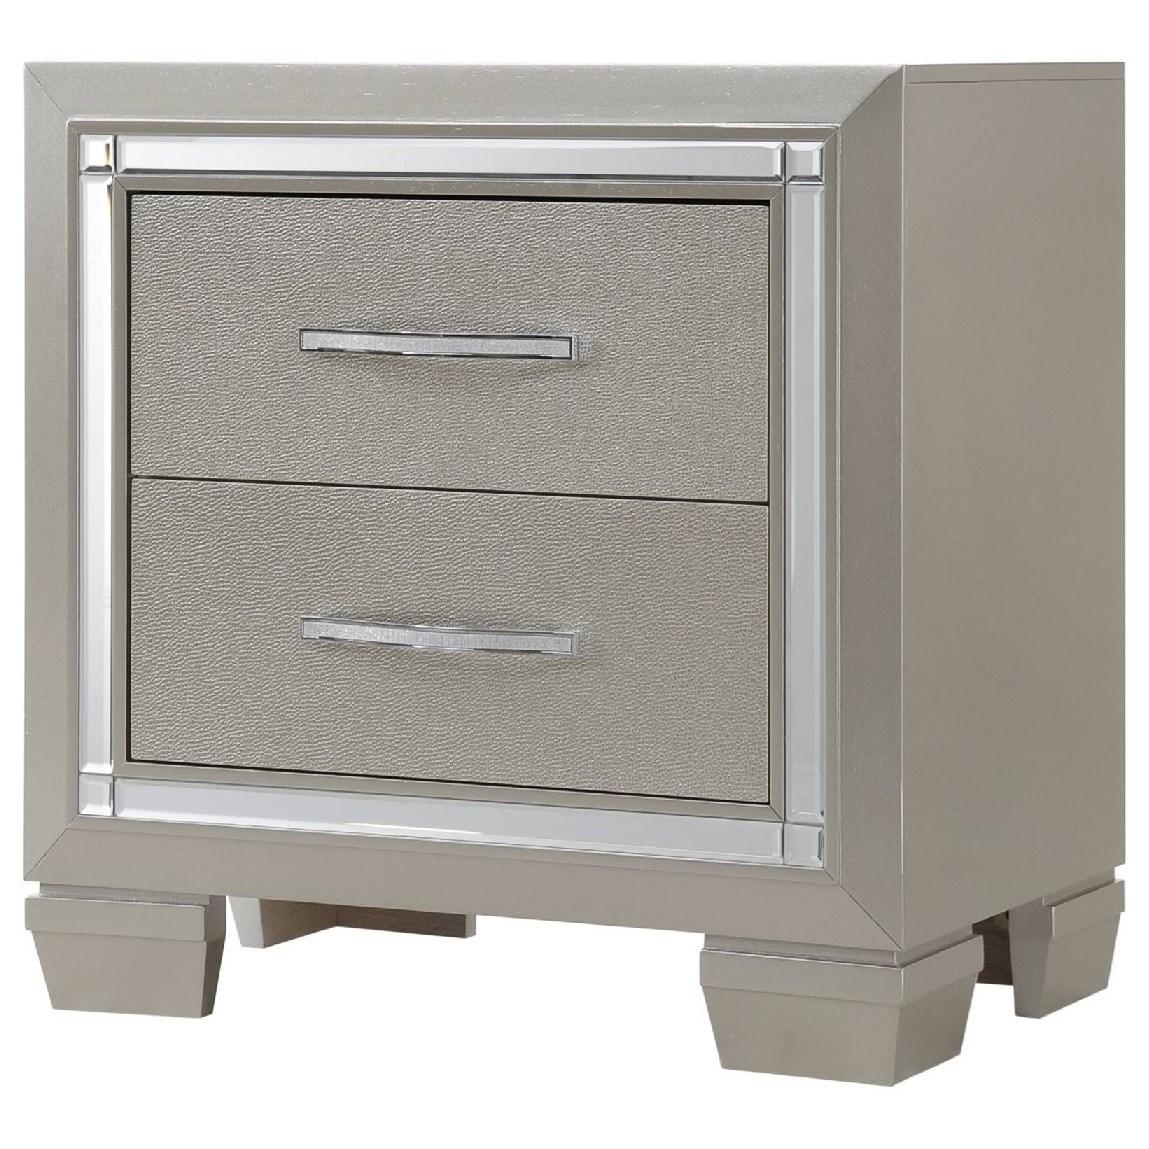 Platinum Nightstand by Elements International at Furniture Fair - North Carolina